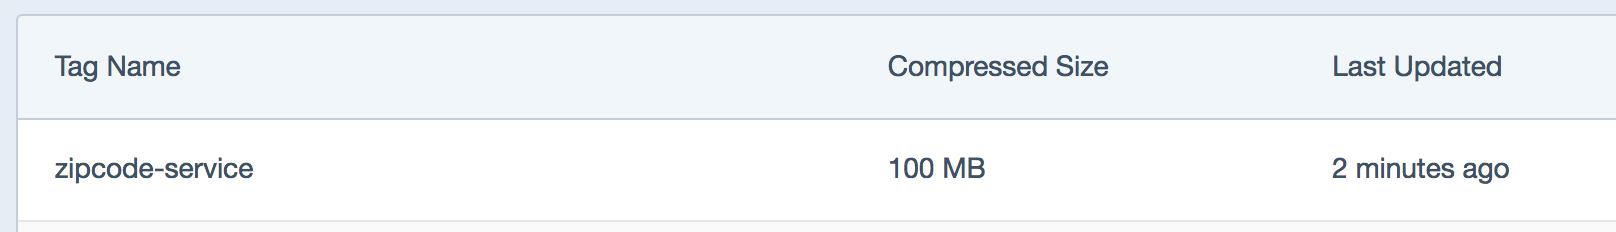 Docker Hub private repository for zipcode-service.